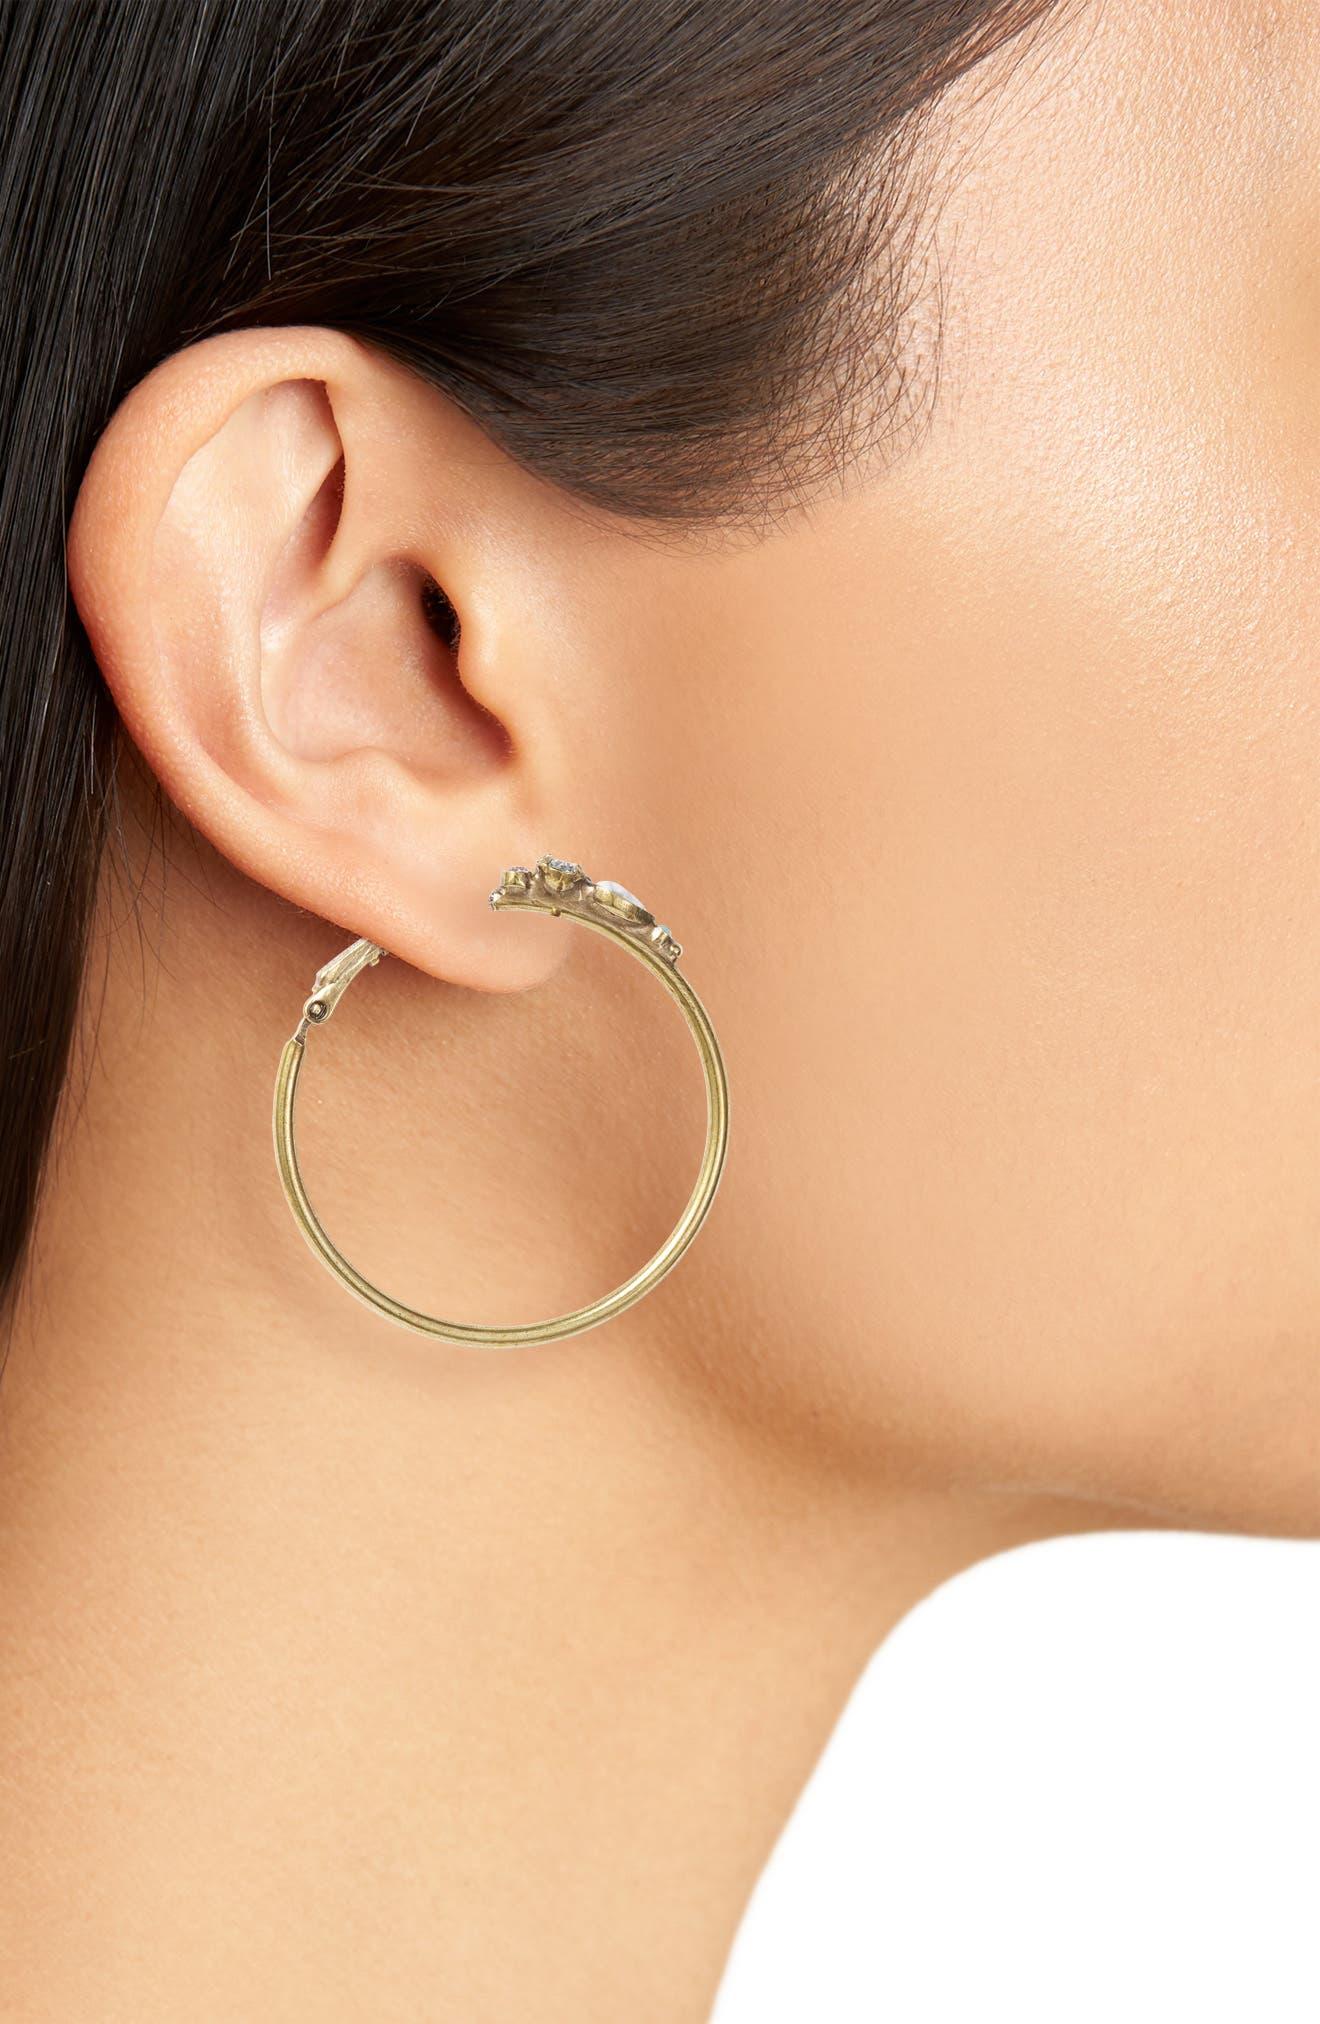 Sorelli Sweet Pea Hoop Earrings,                             Alternate thumbnail 2, color,                             White